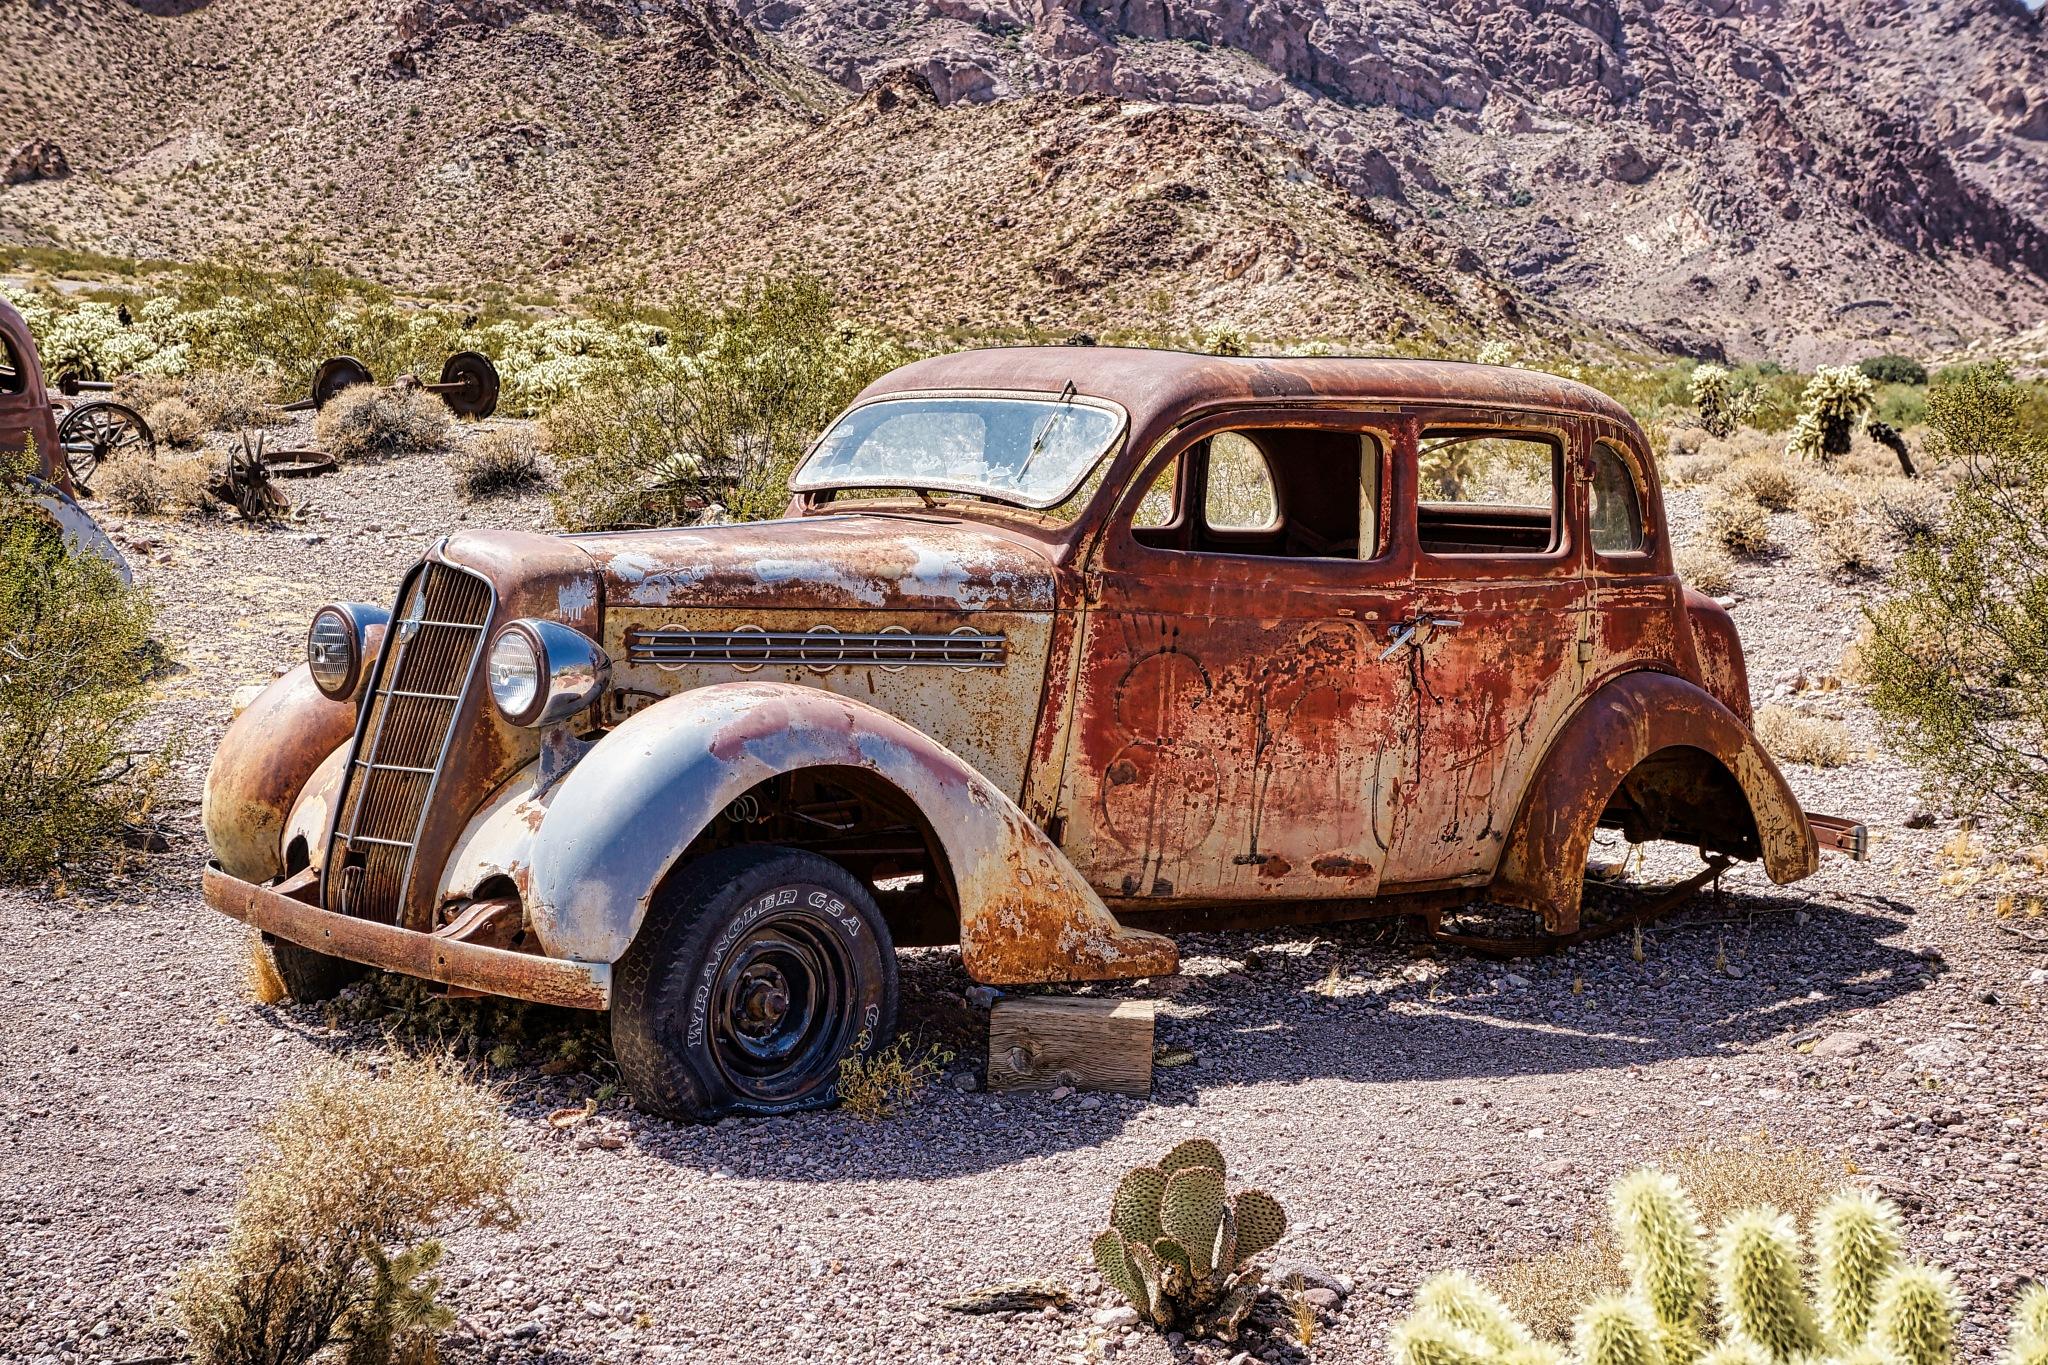 Stuck in the desert by Harrison Hanville